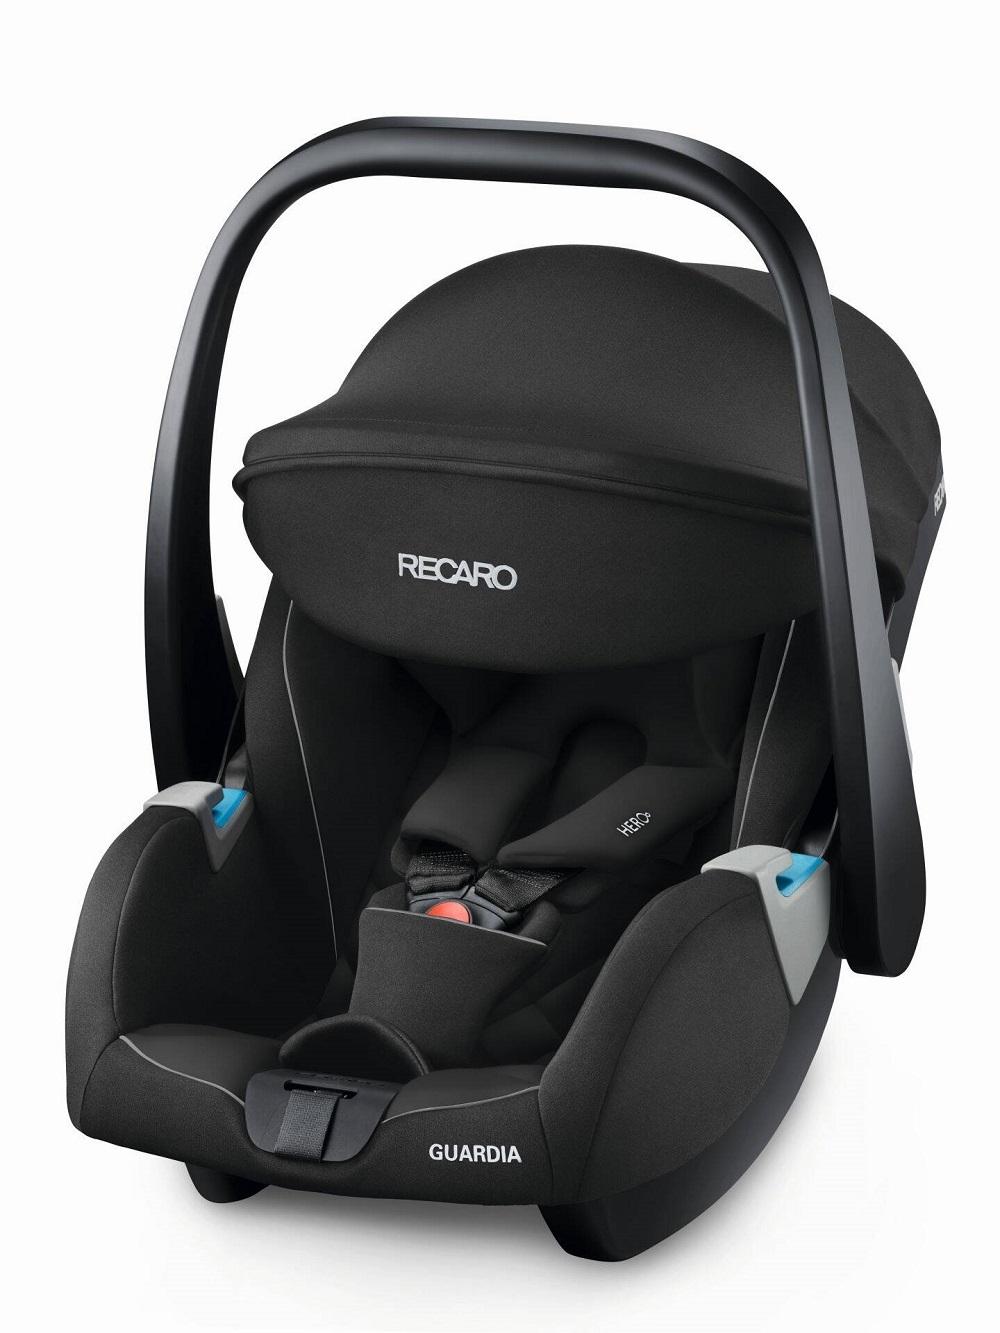 Recaro Infant Carrier (Provided 2-year Warranty)